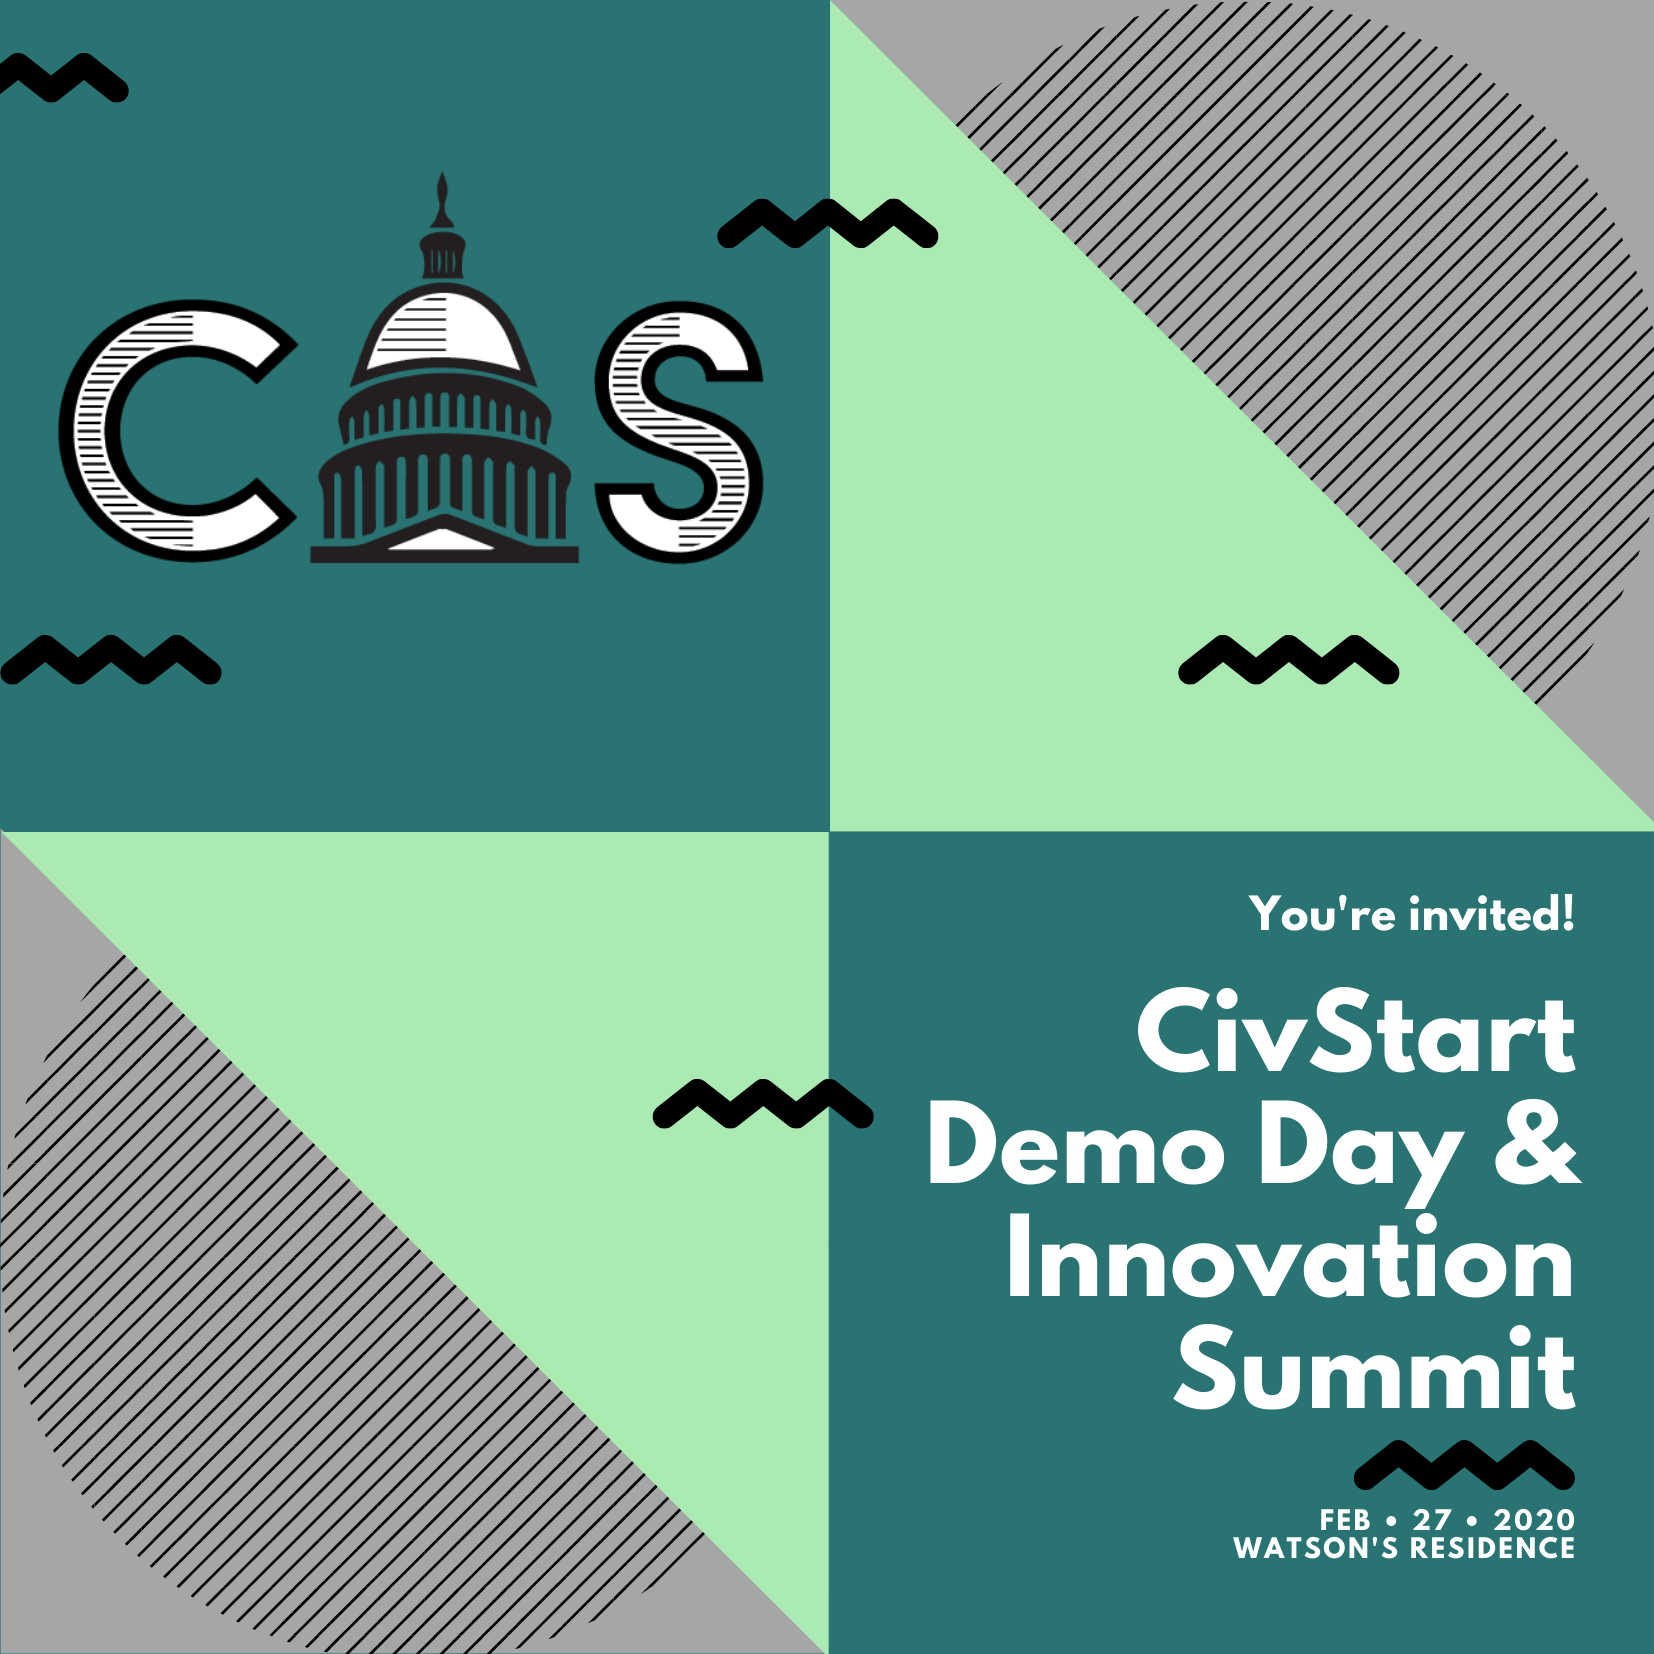 CivStart Demo Day